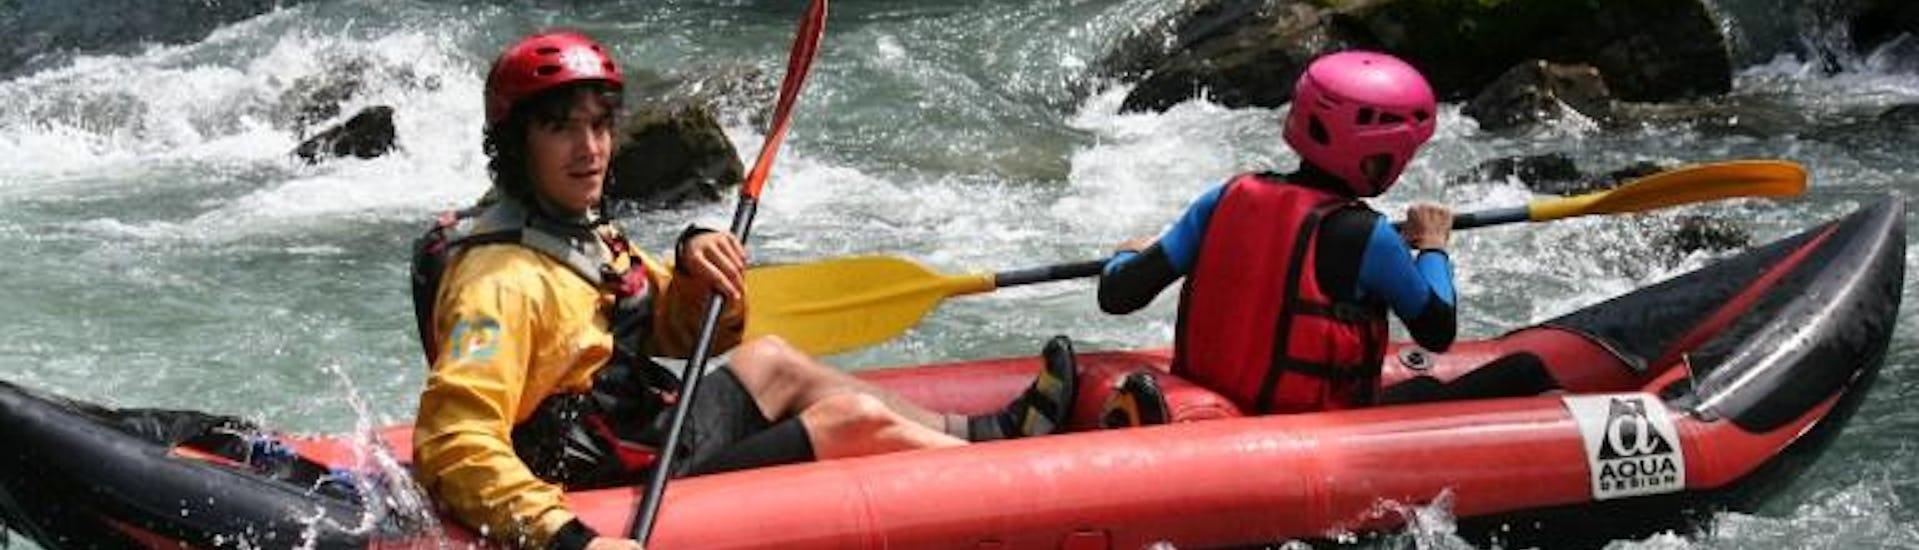 Canoe on the River - Sarine